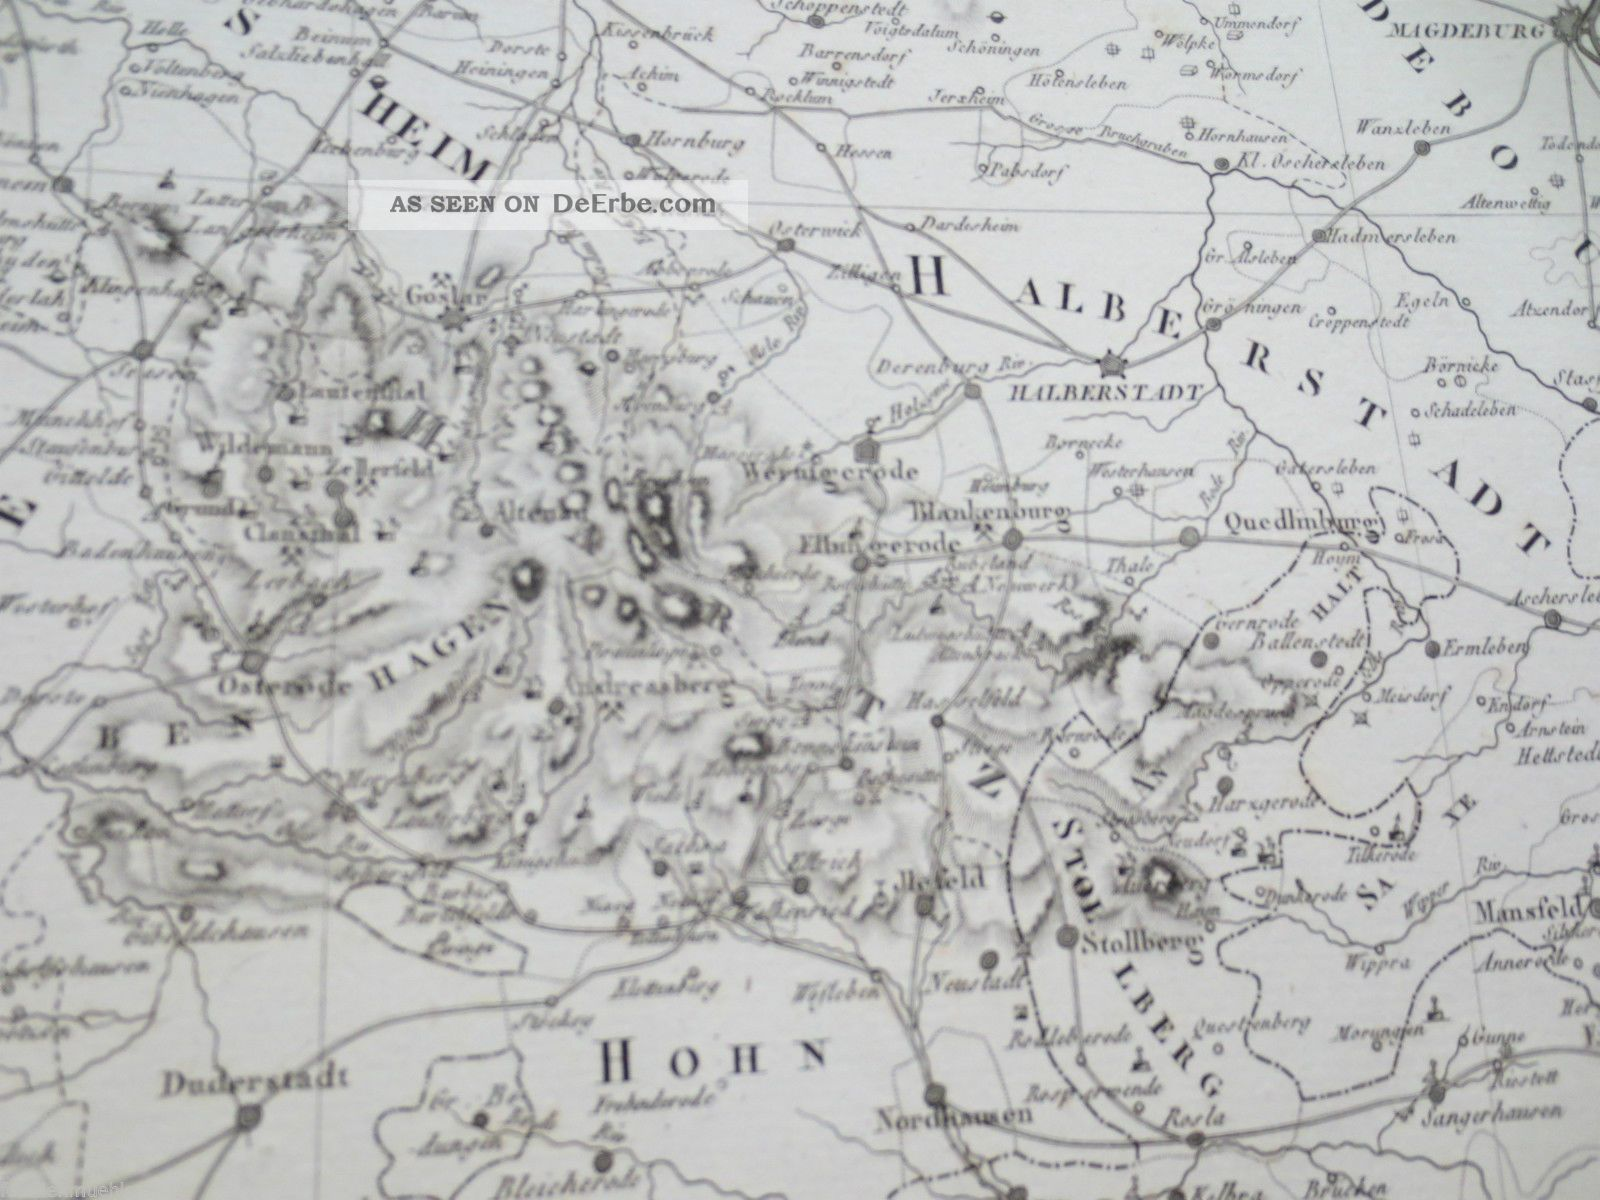 Bergbau Erzgebirge Karte.Bergbau Karte Erzgebirge Thuringen 1819 Schacht Plan